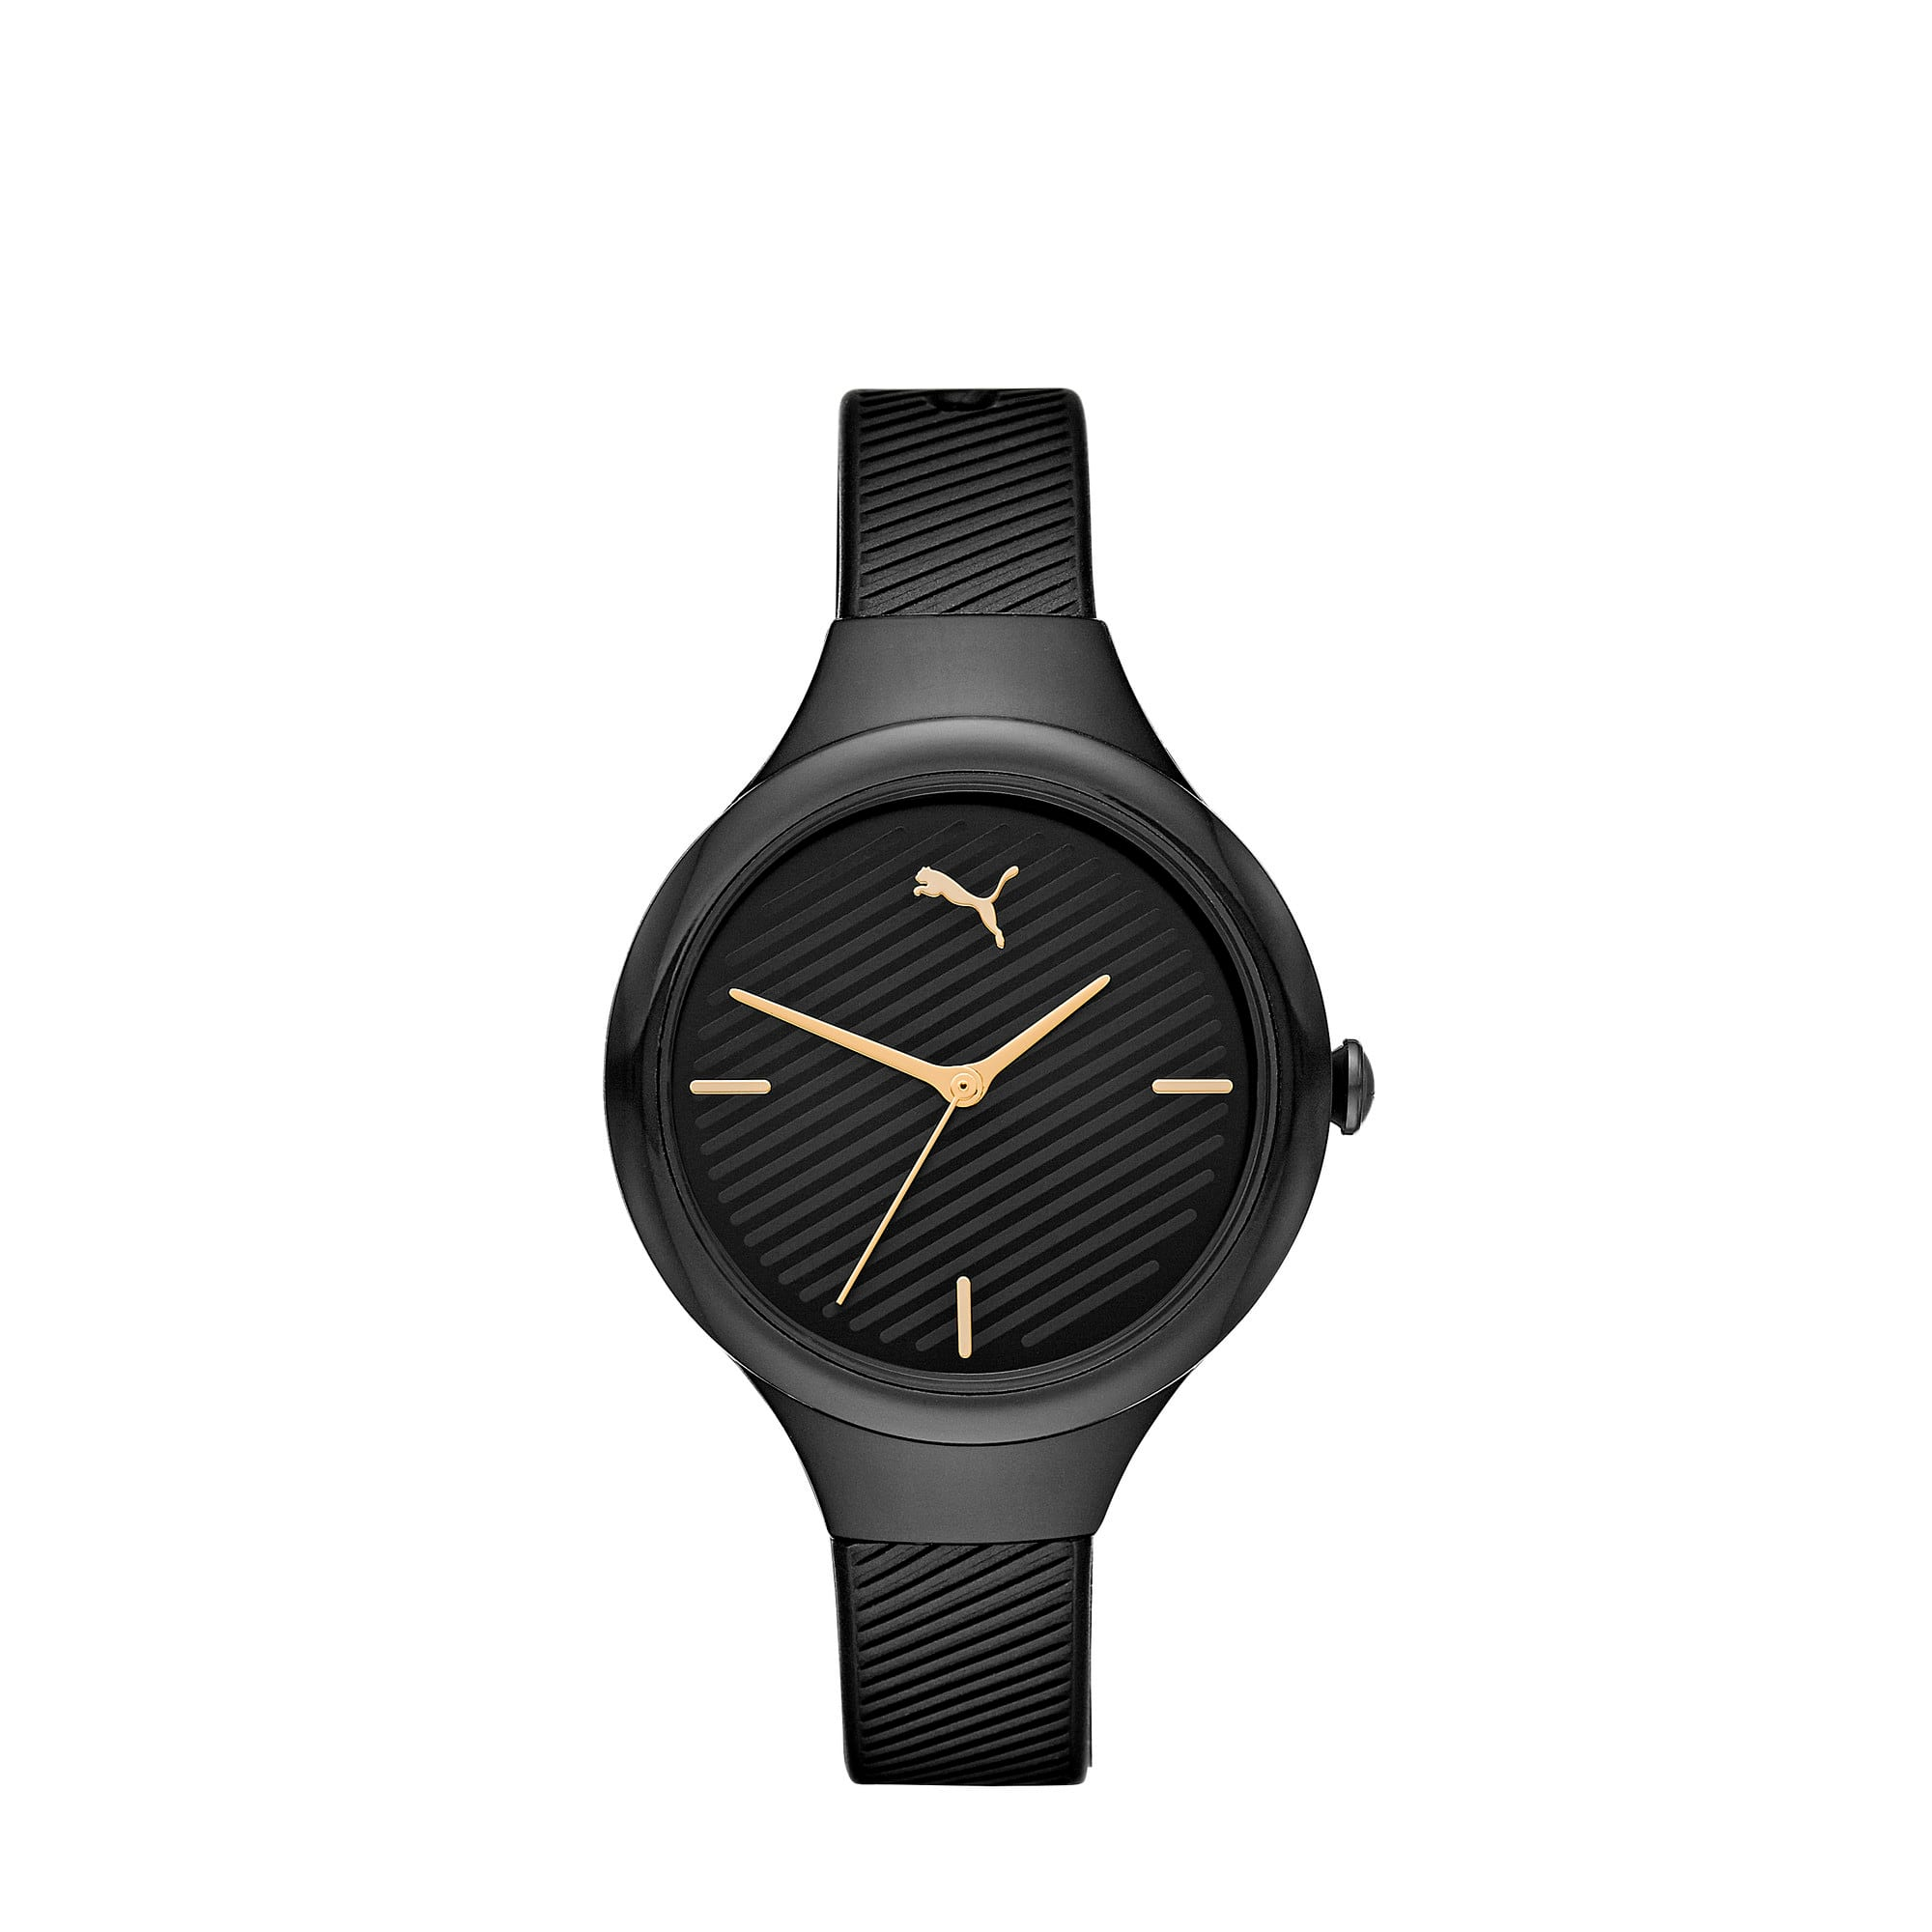 Thumbnail 1 of CONTOUR Ultra-Slim Damen Uhr, Black/Black, medium